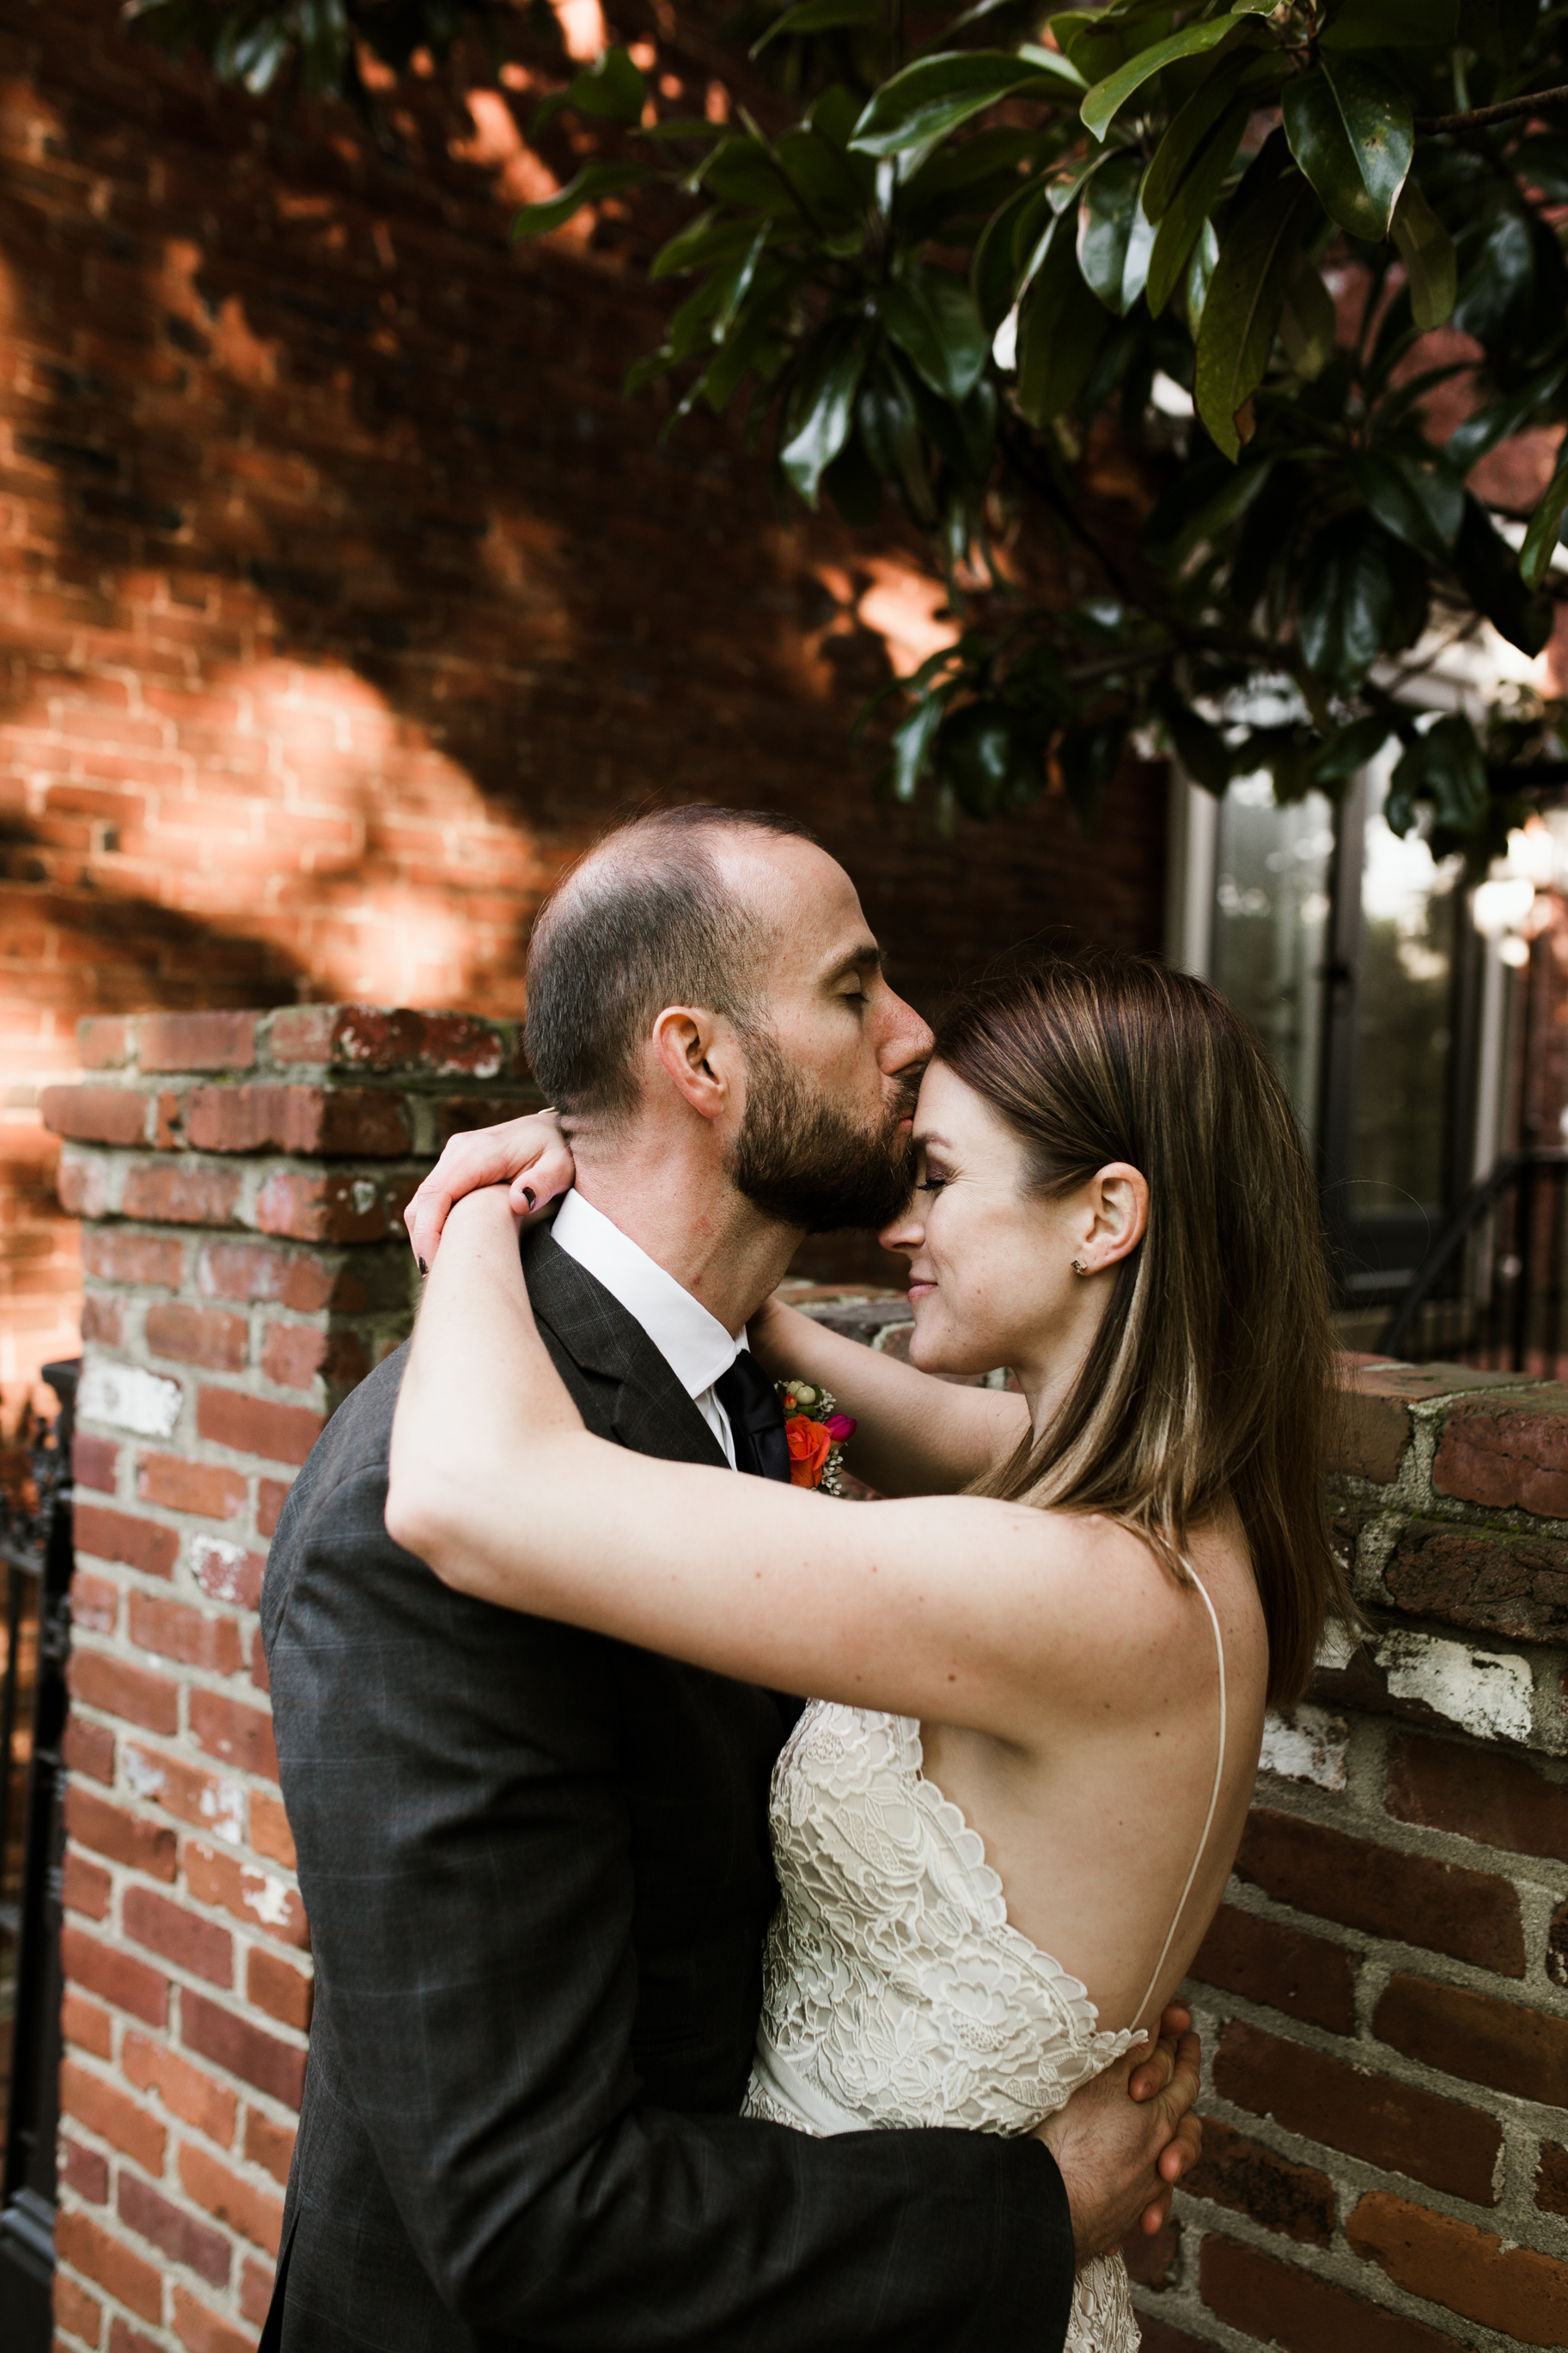 Louisville Courthouse Wedding Louisville Wedding Photographer 2018 Crystal Ludwick Photo Louisville Wedding Photographer Kentucky Wedding Photographer (67 of 76).jpg